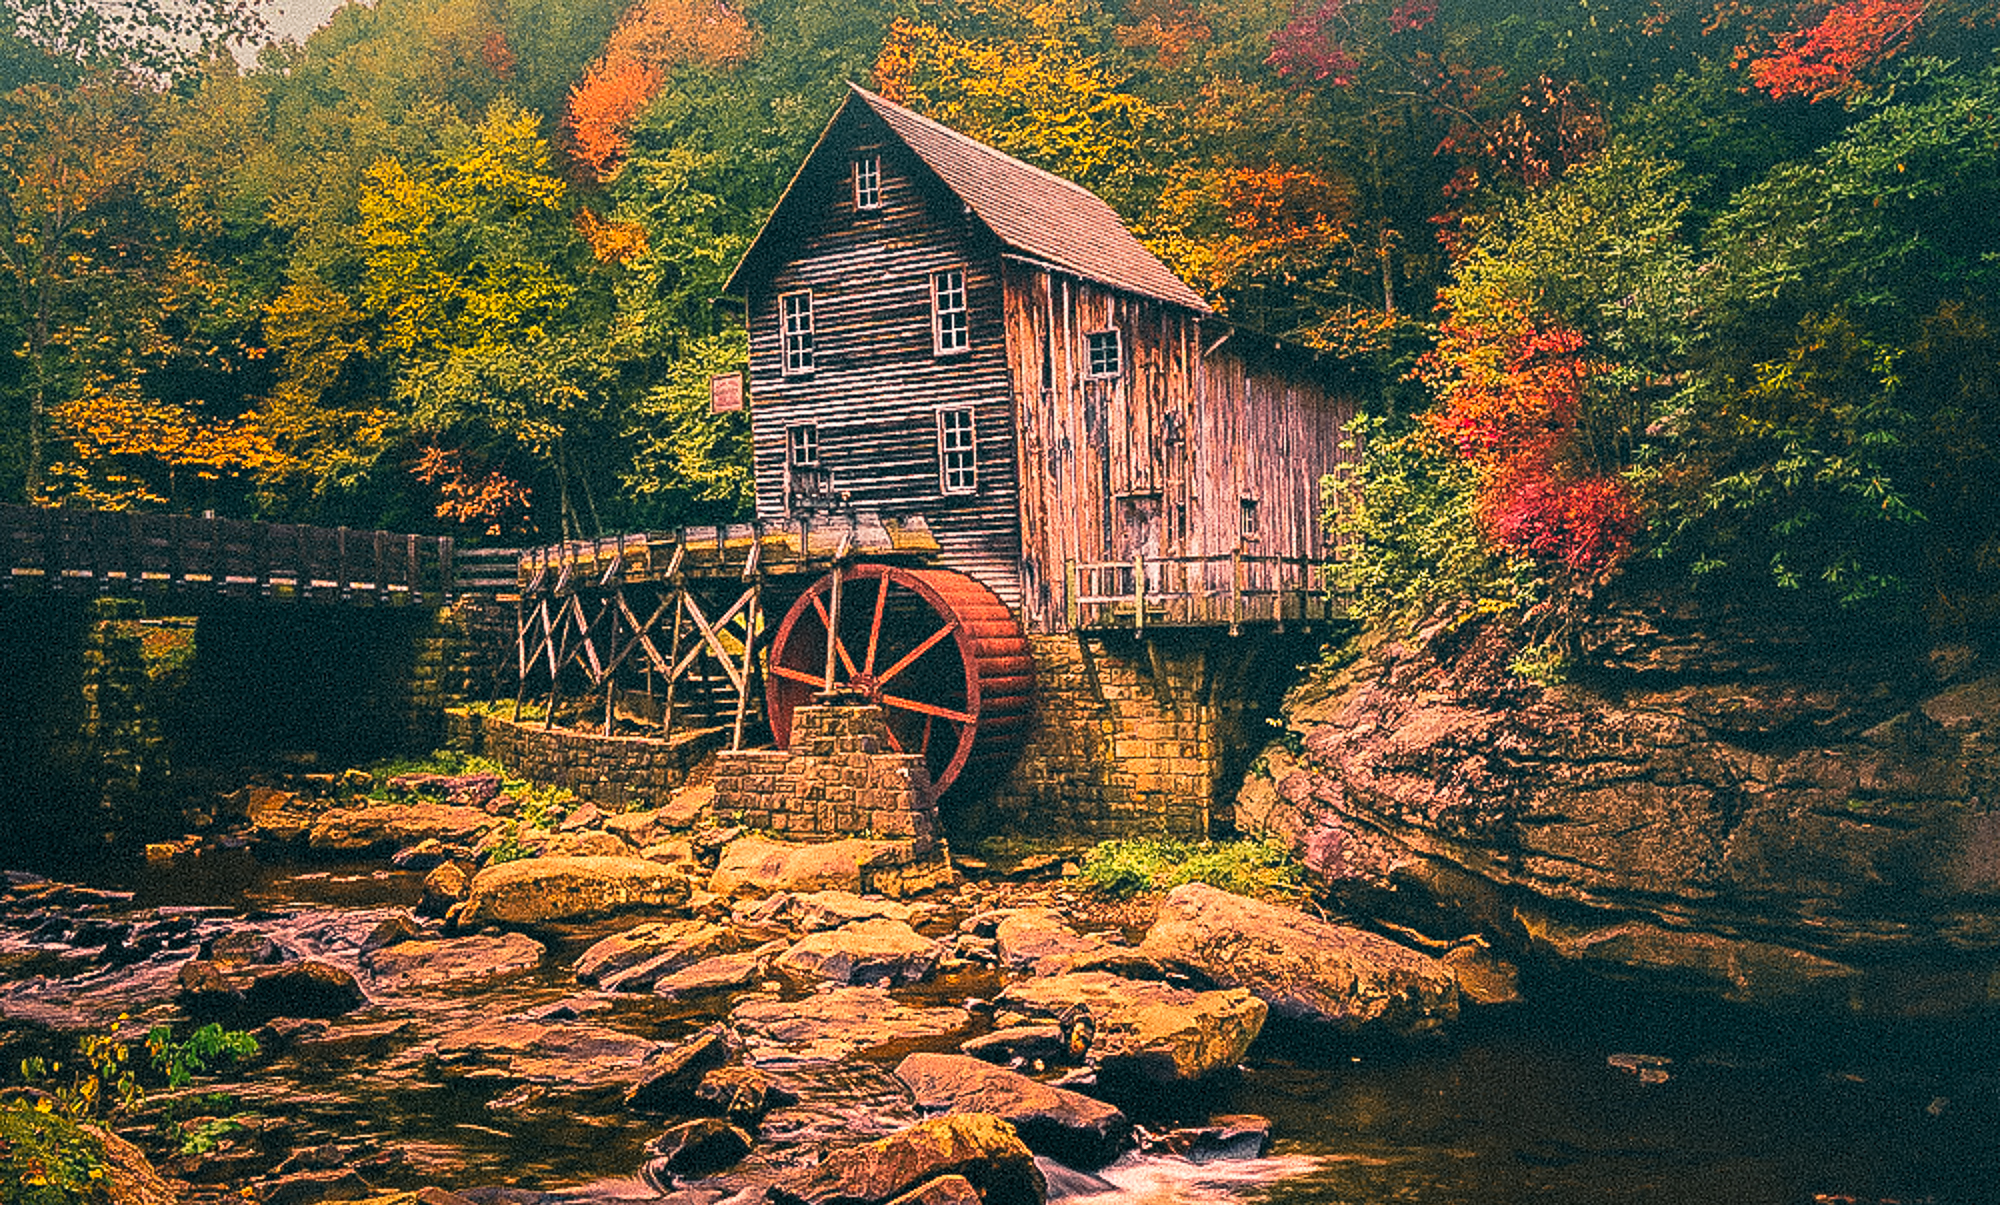 58082A - Glade Creek Grist Mill - Ba